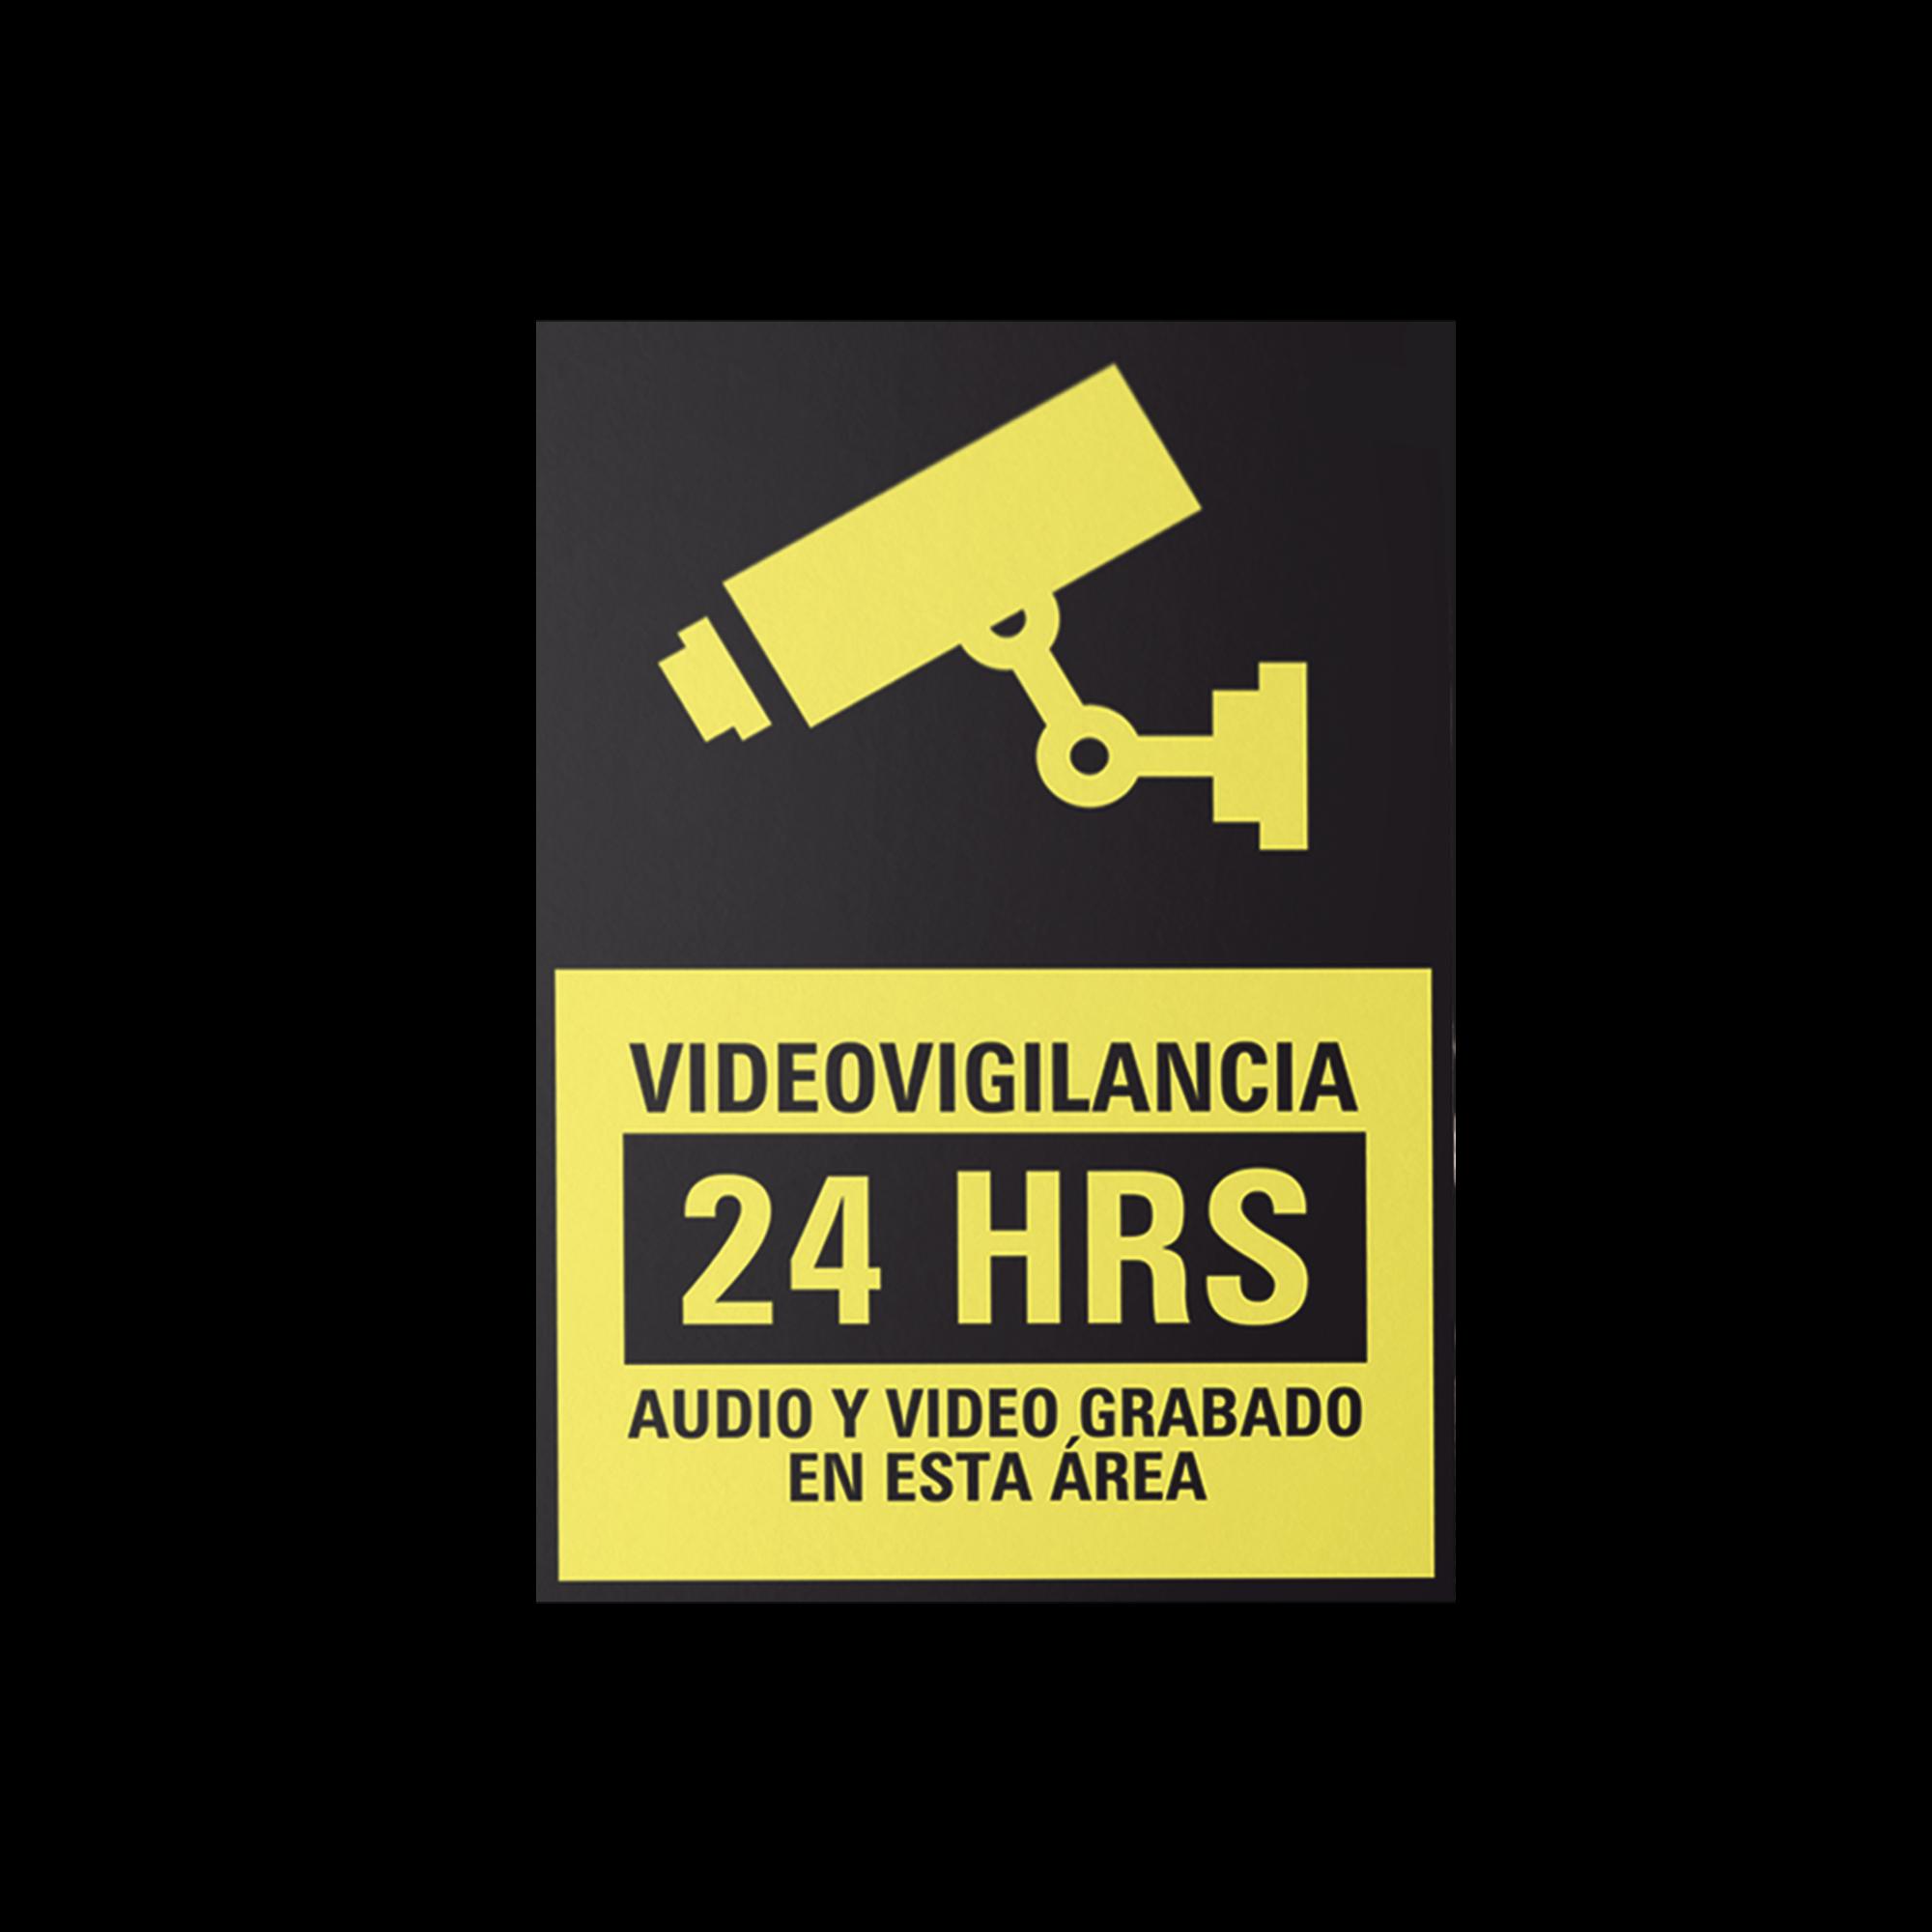 Etiqueta de Videovigilancia en Vinil Adhesivo Mate / Paquete con 10